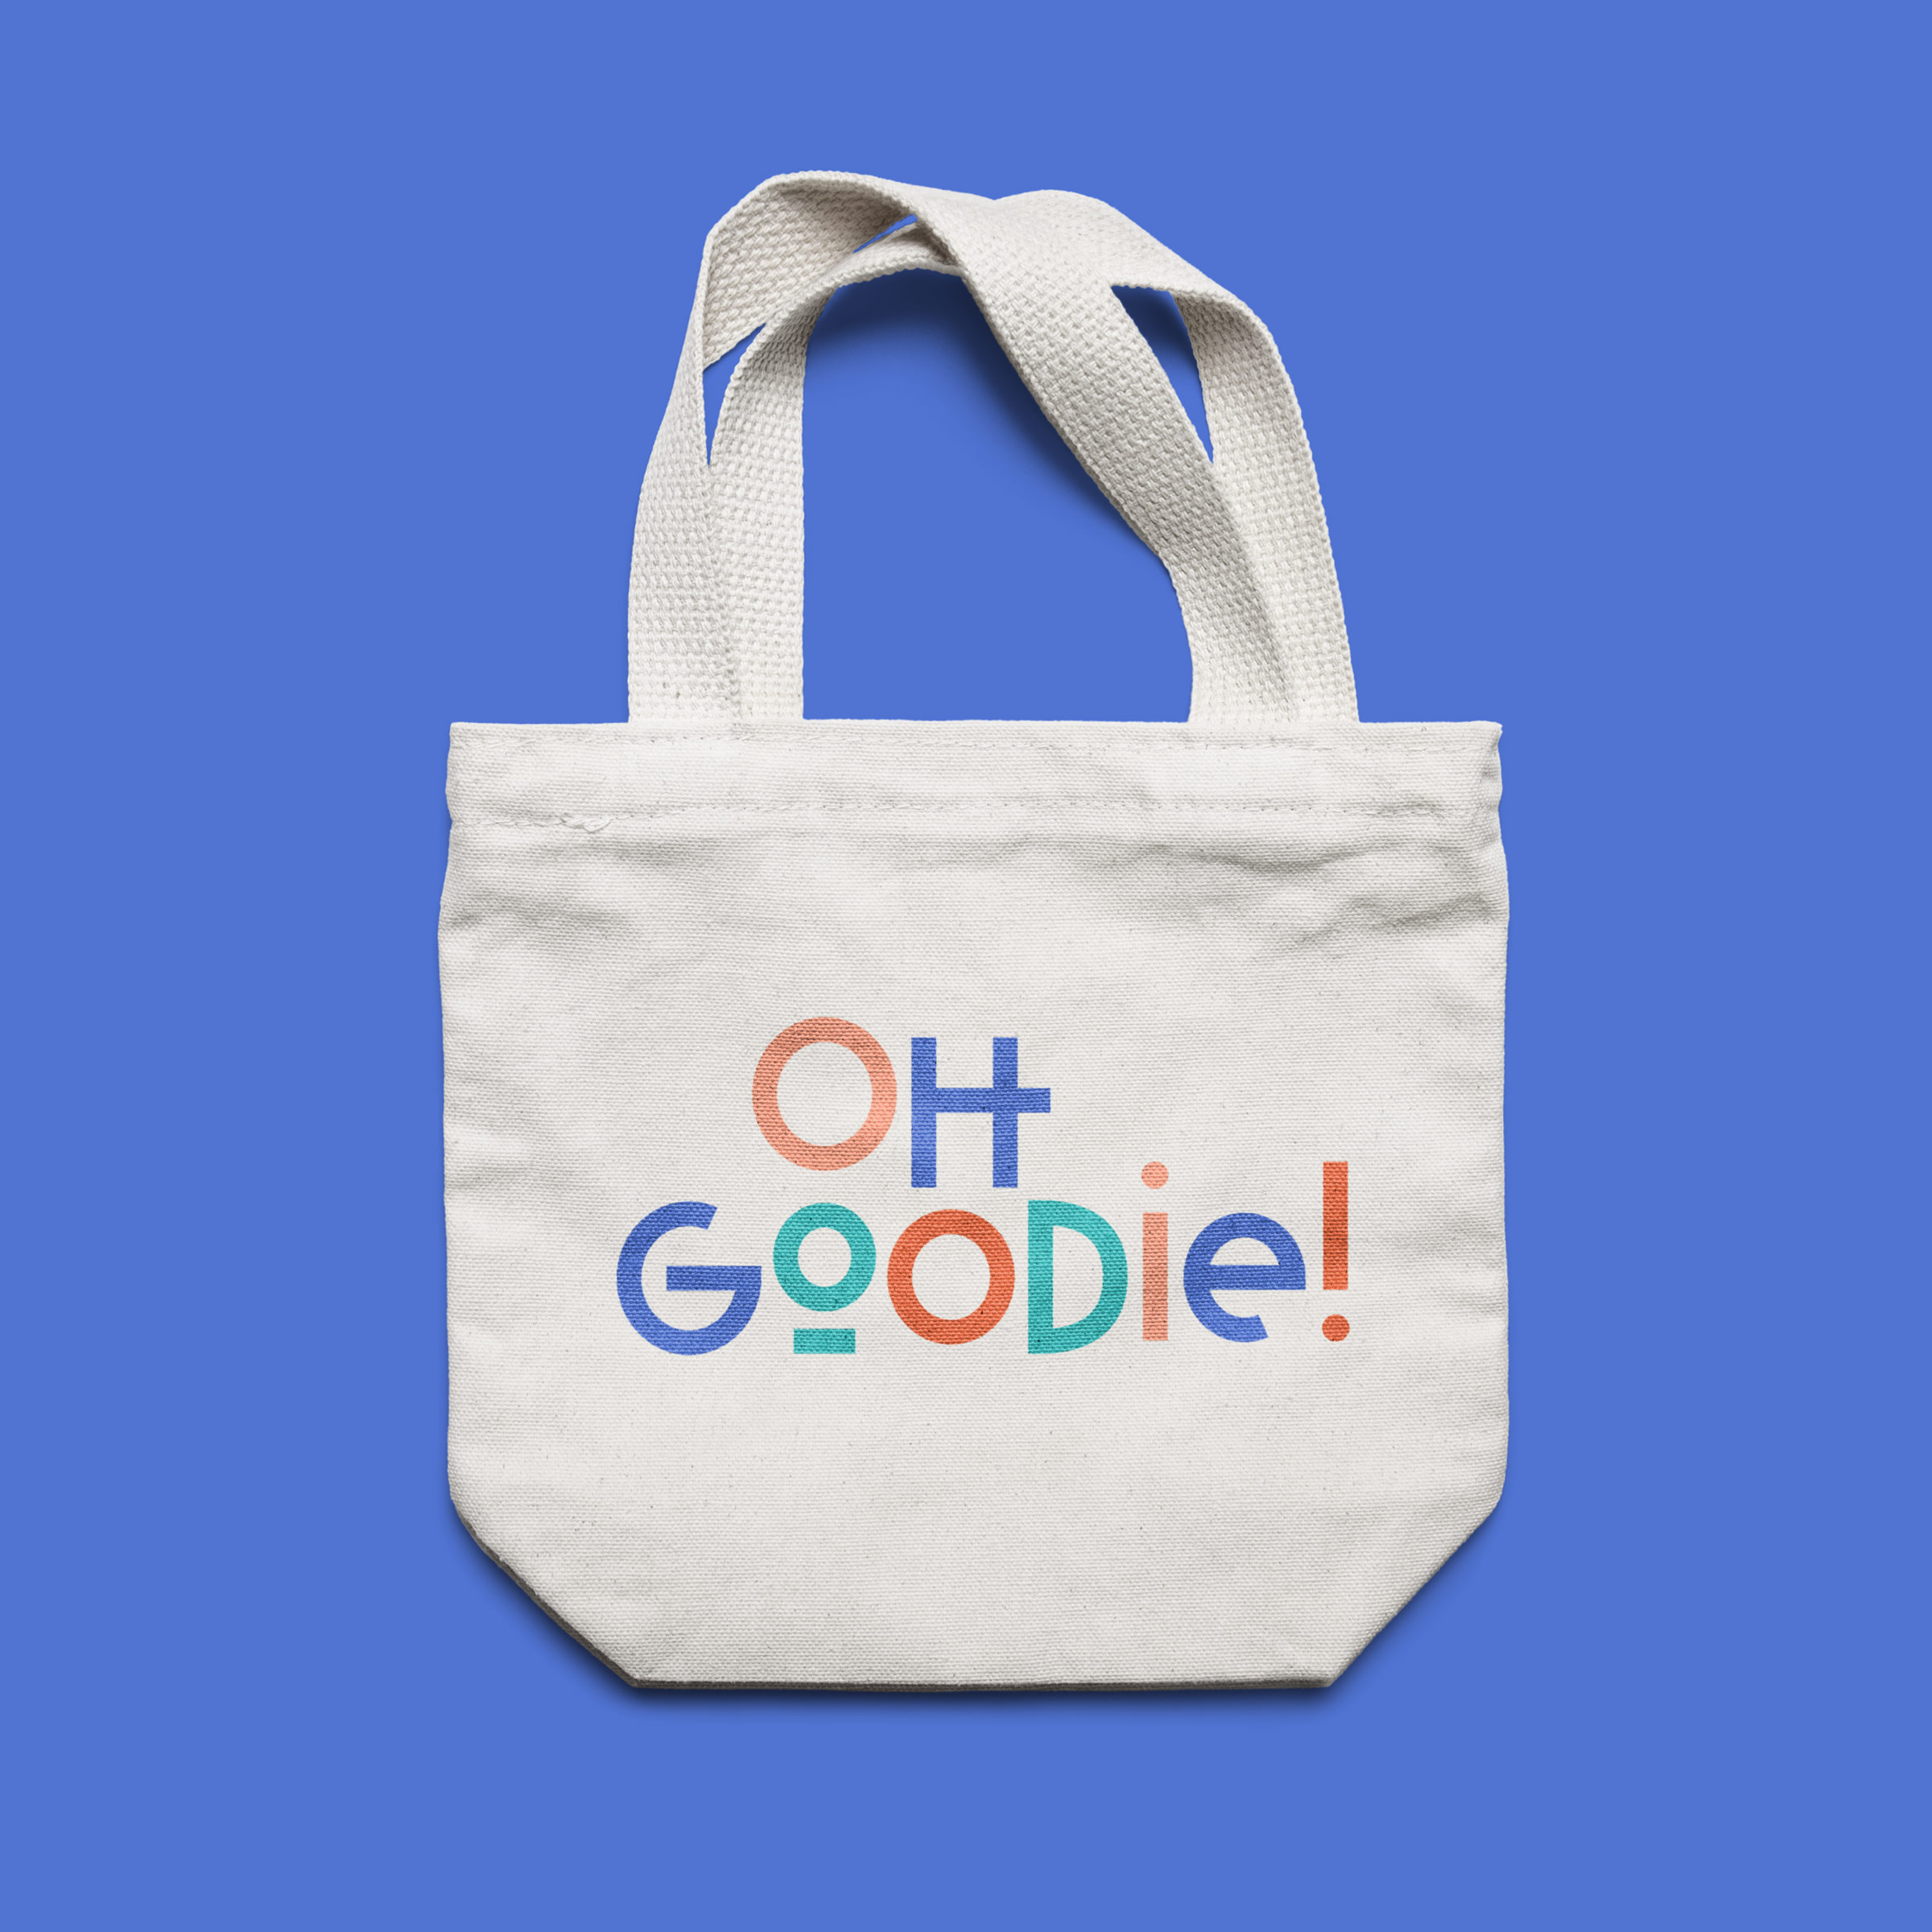 Oh Goodie! |  Branding